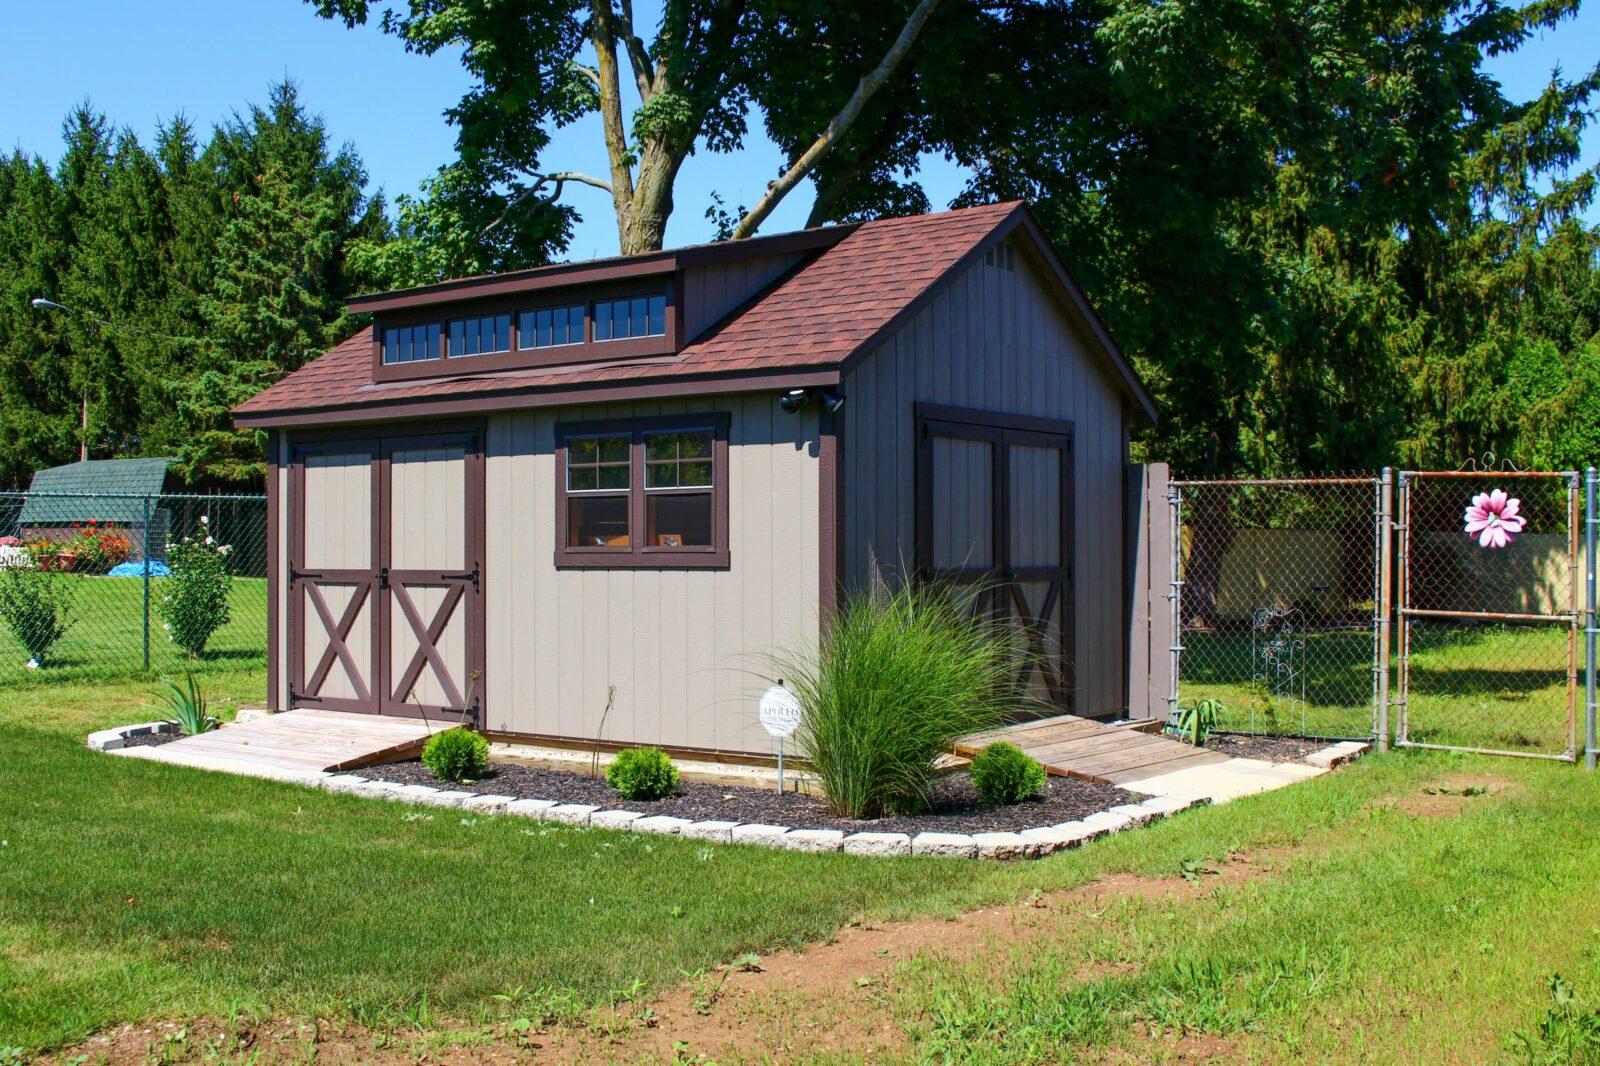 cottage style garden shed for sale near dayton ohio